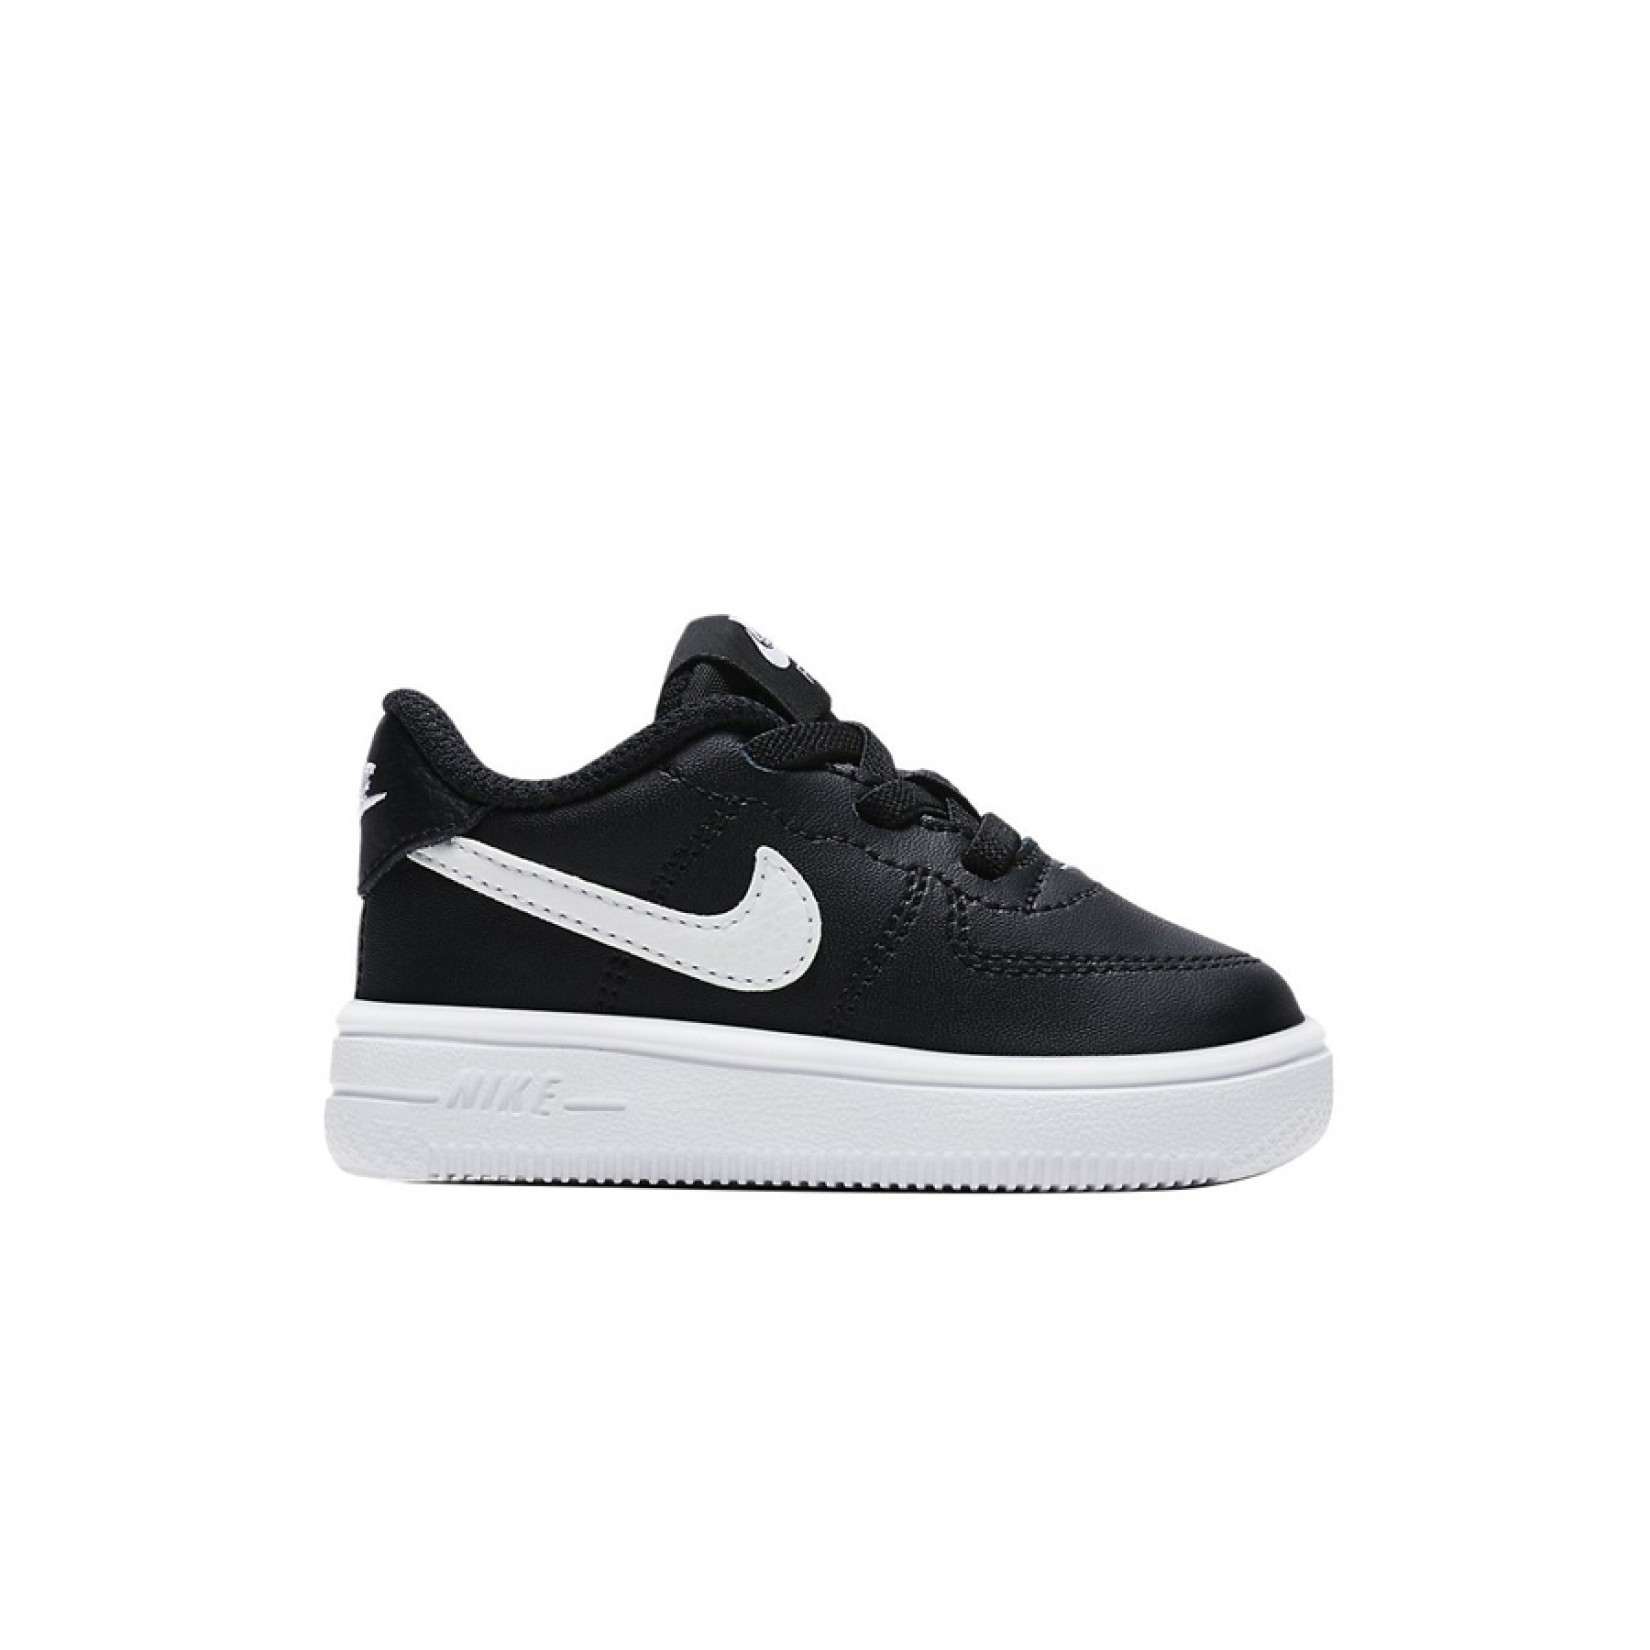 9f71c37ae3d Βρεφικά Παπούτσια Nike Air Force 1 18 TD Μαύρο / Λευκό | All-Sports.gr